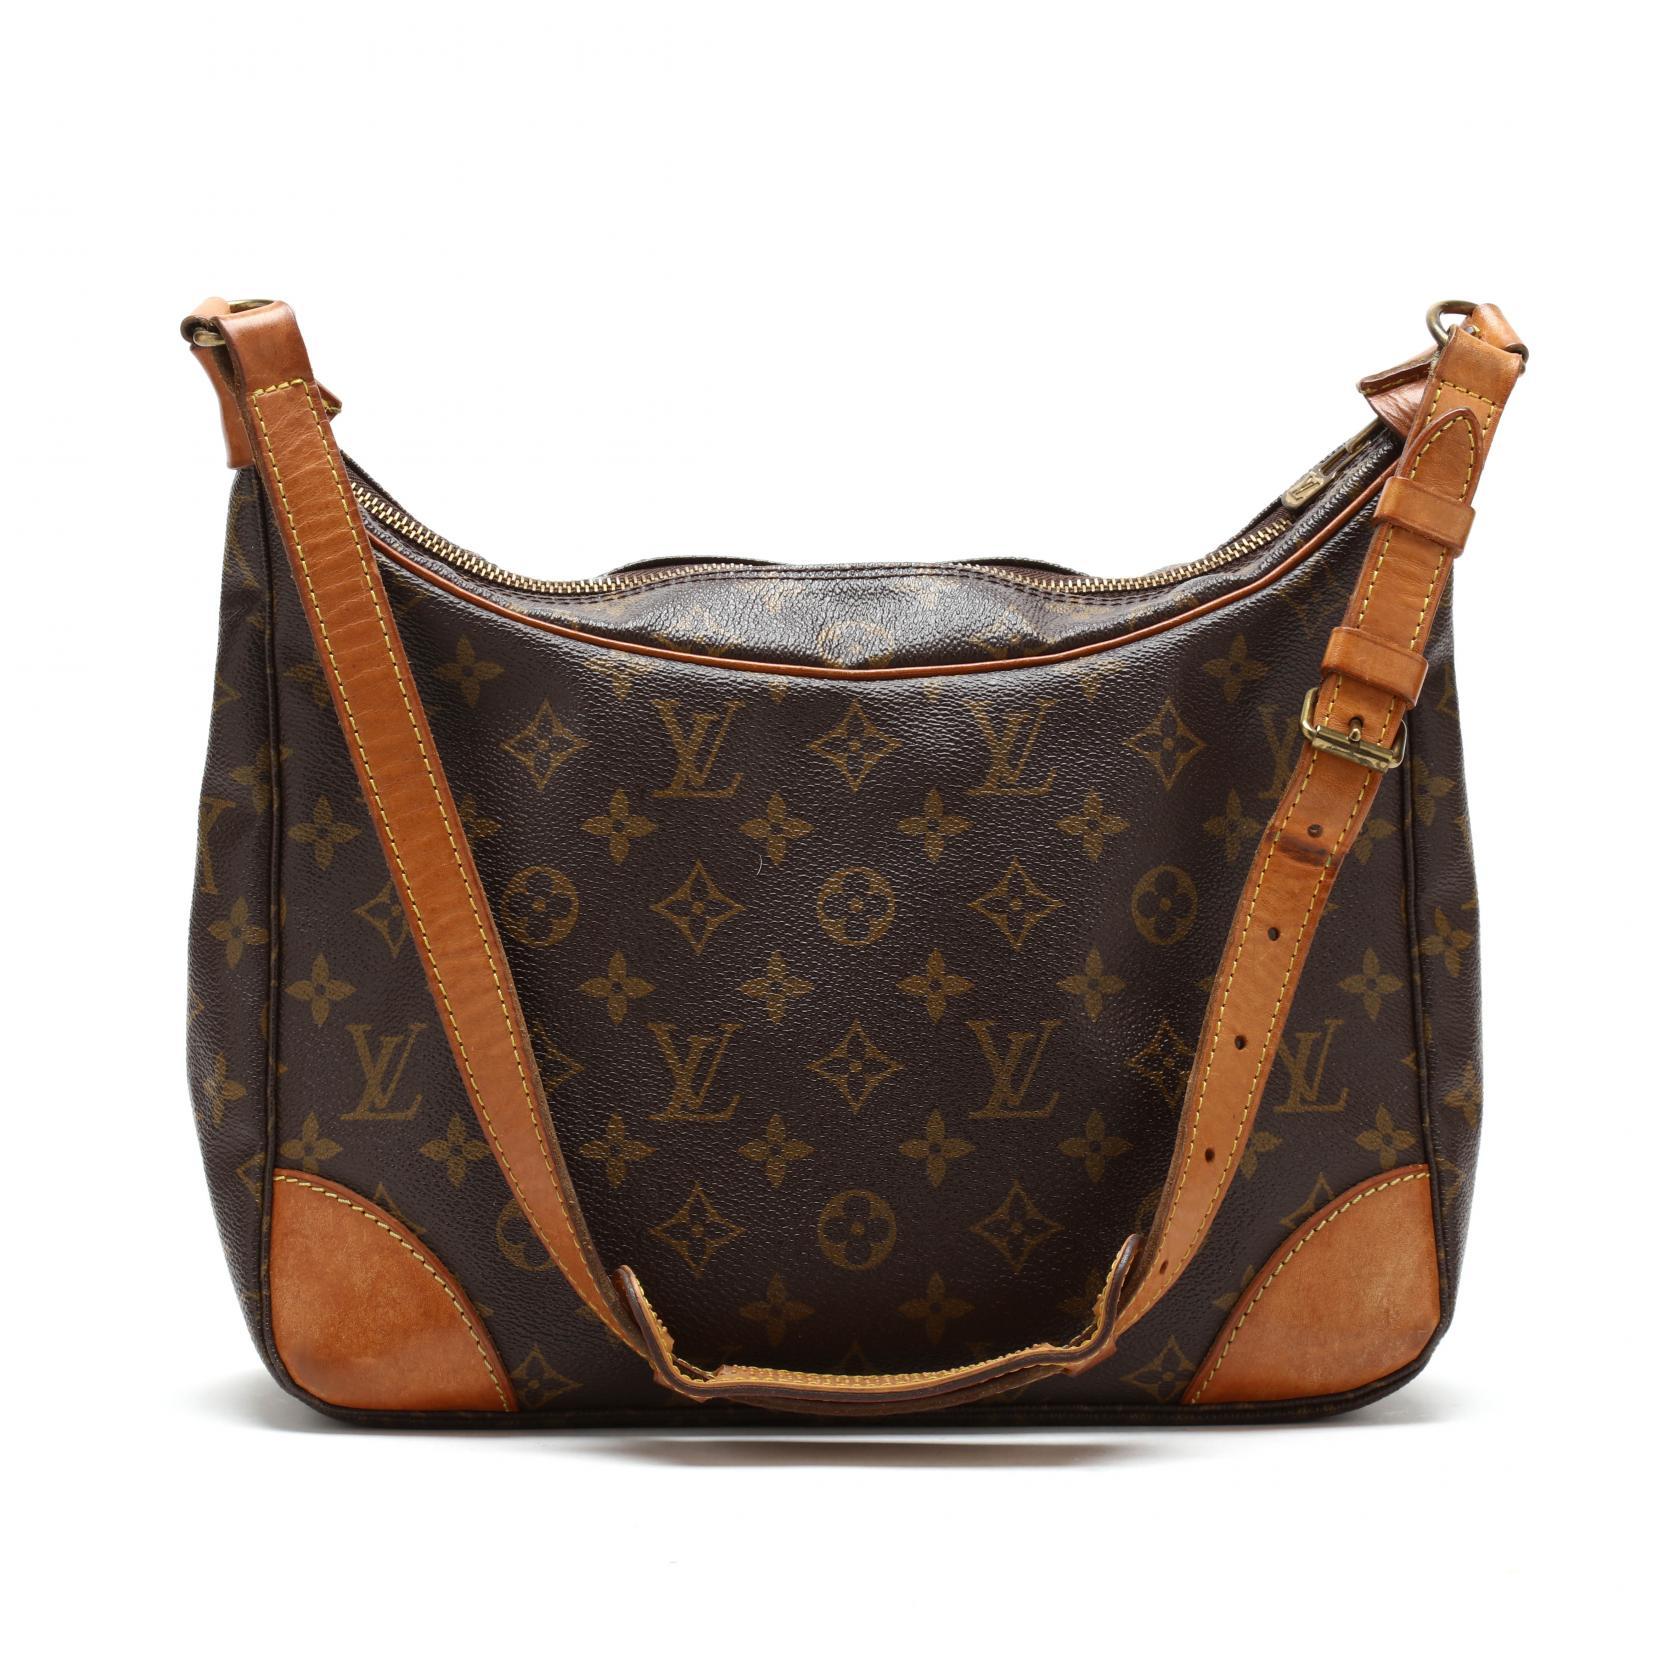 monogram-canvas-handbag-i-boulogne-i-louis-vuitton